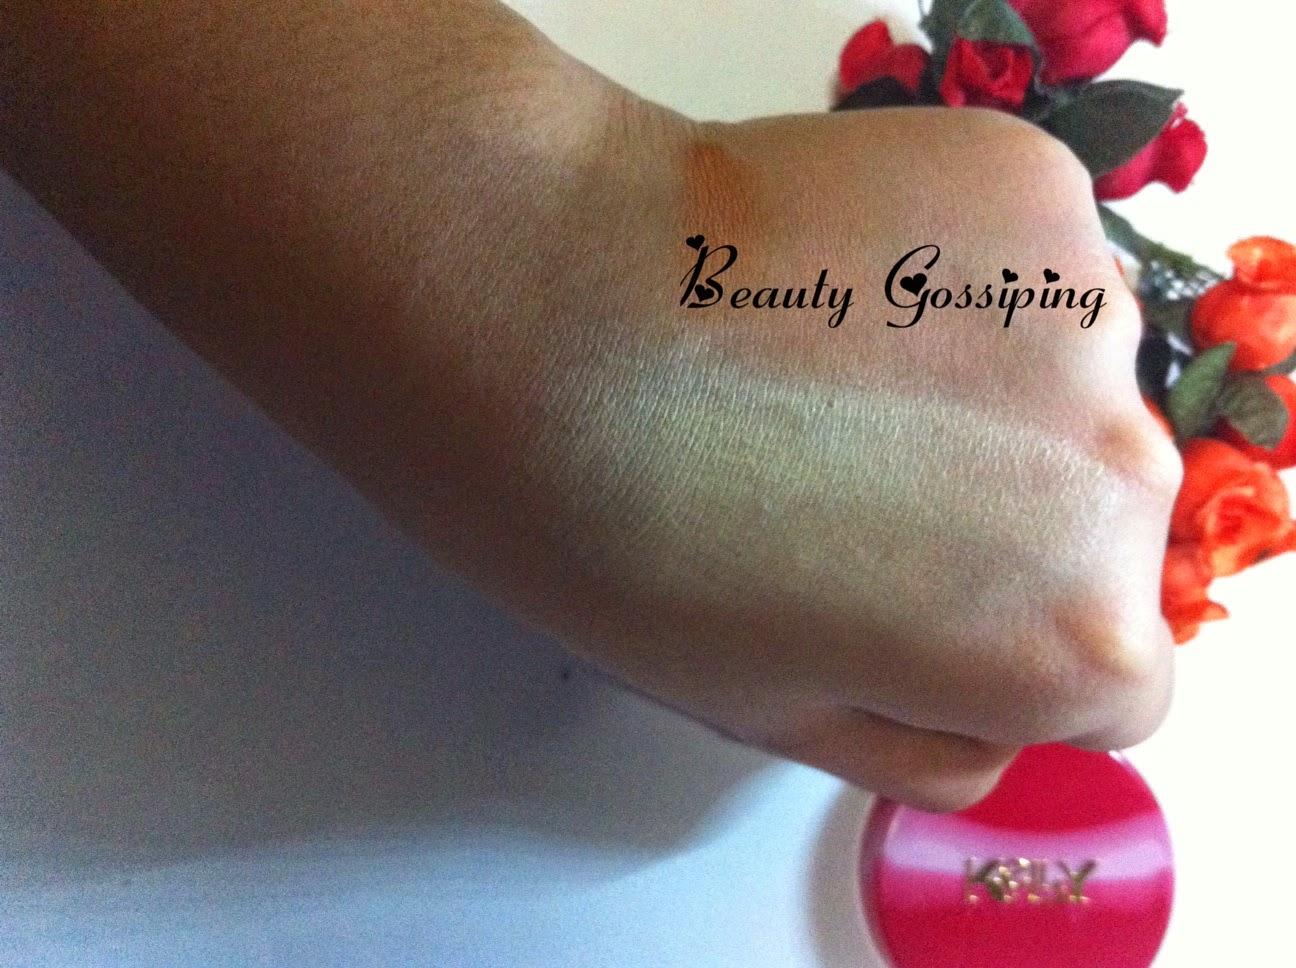 Kelly Pearl Cream | Beauty Gossiping